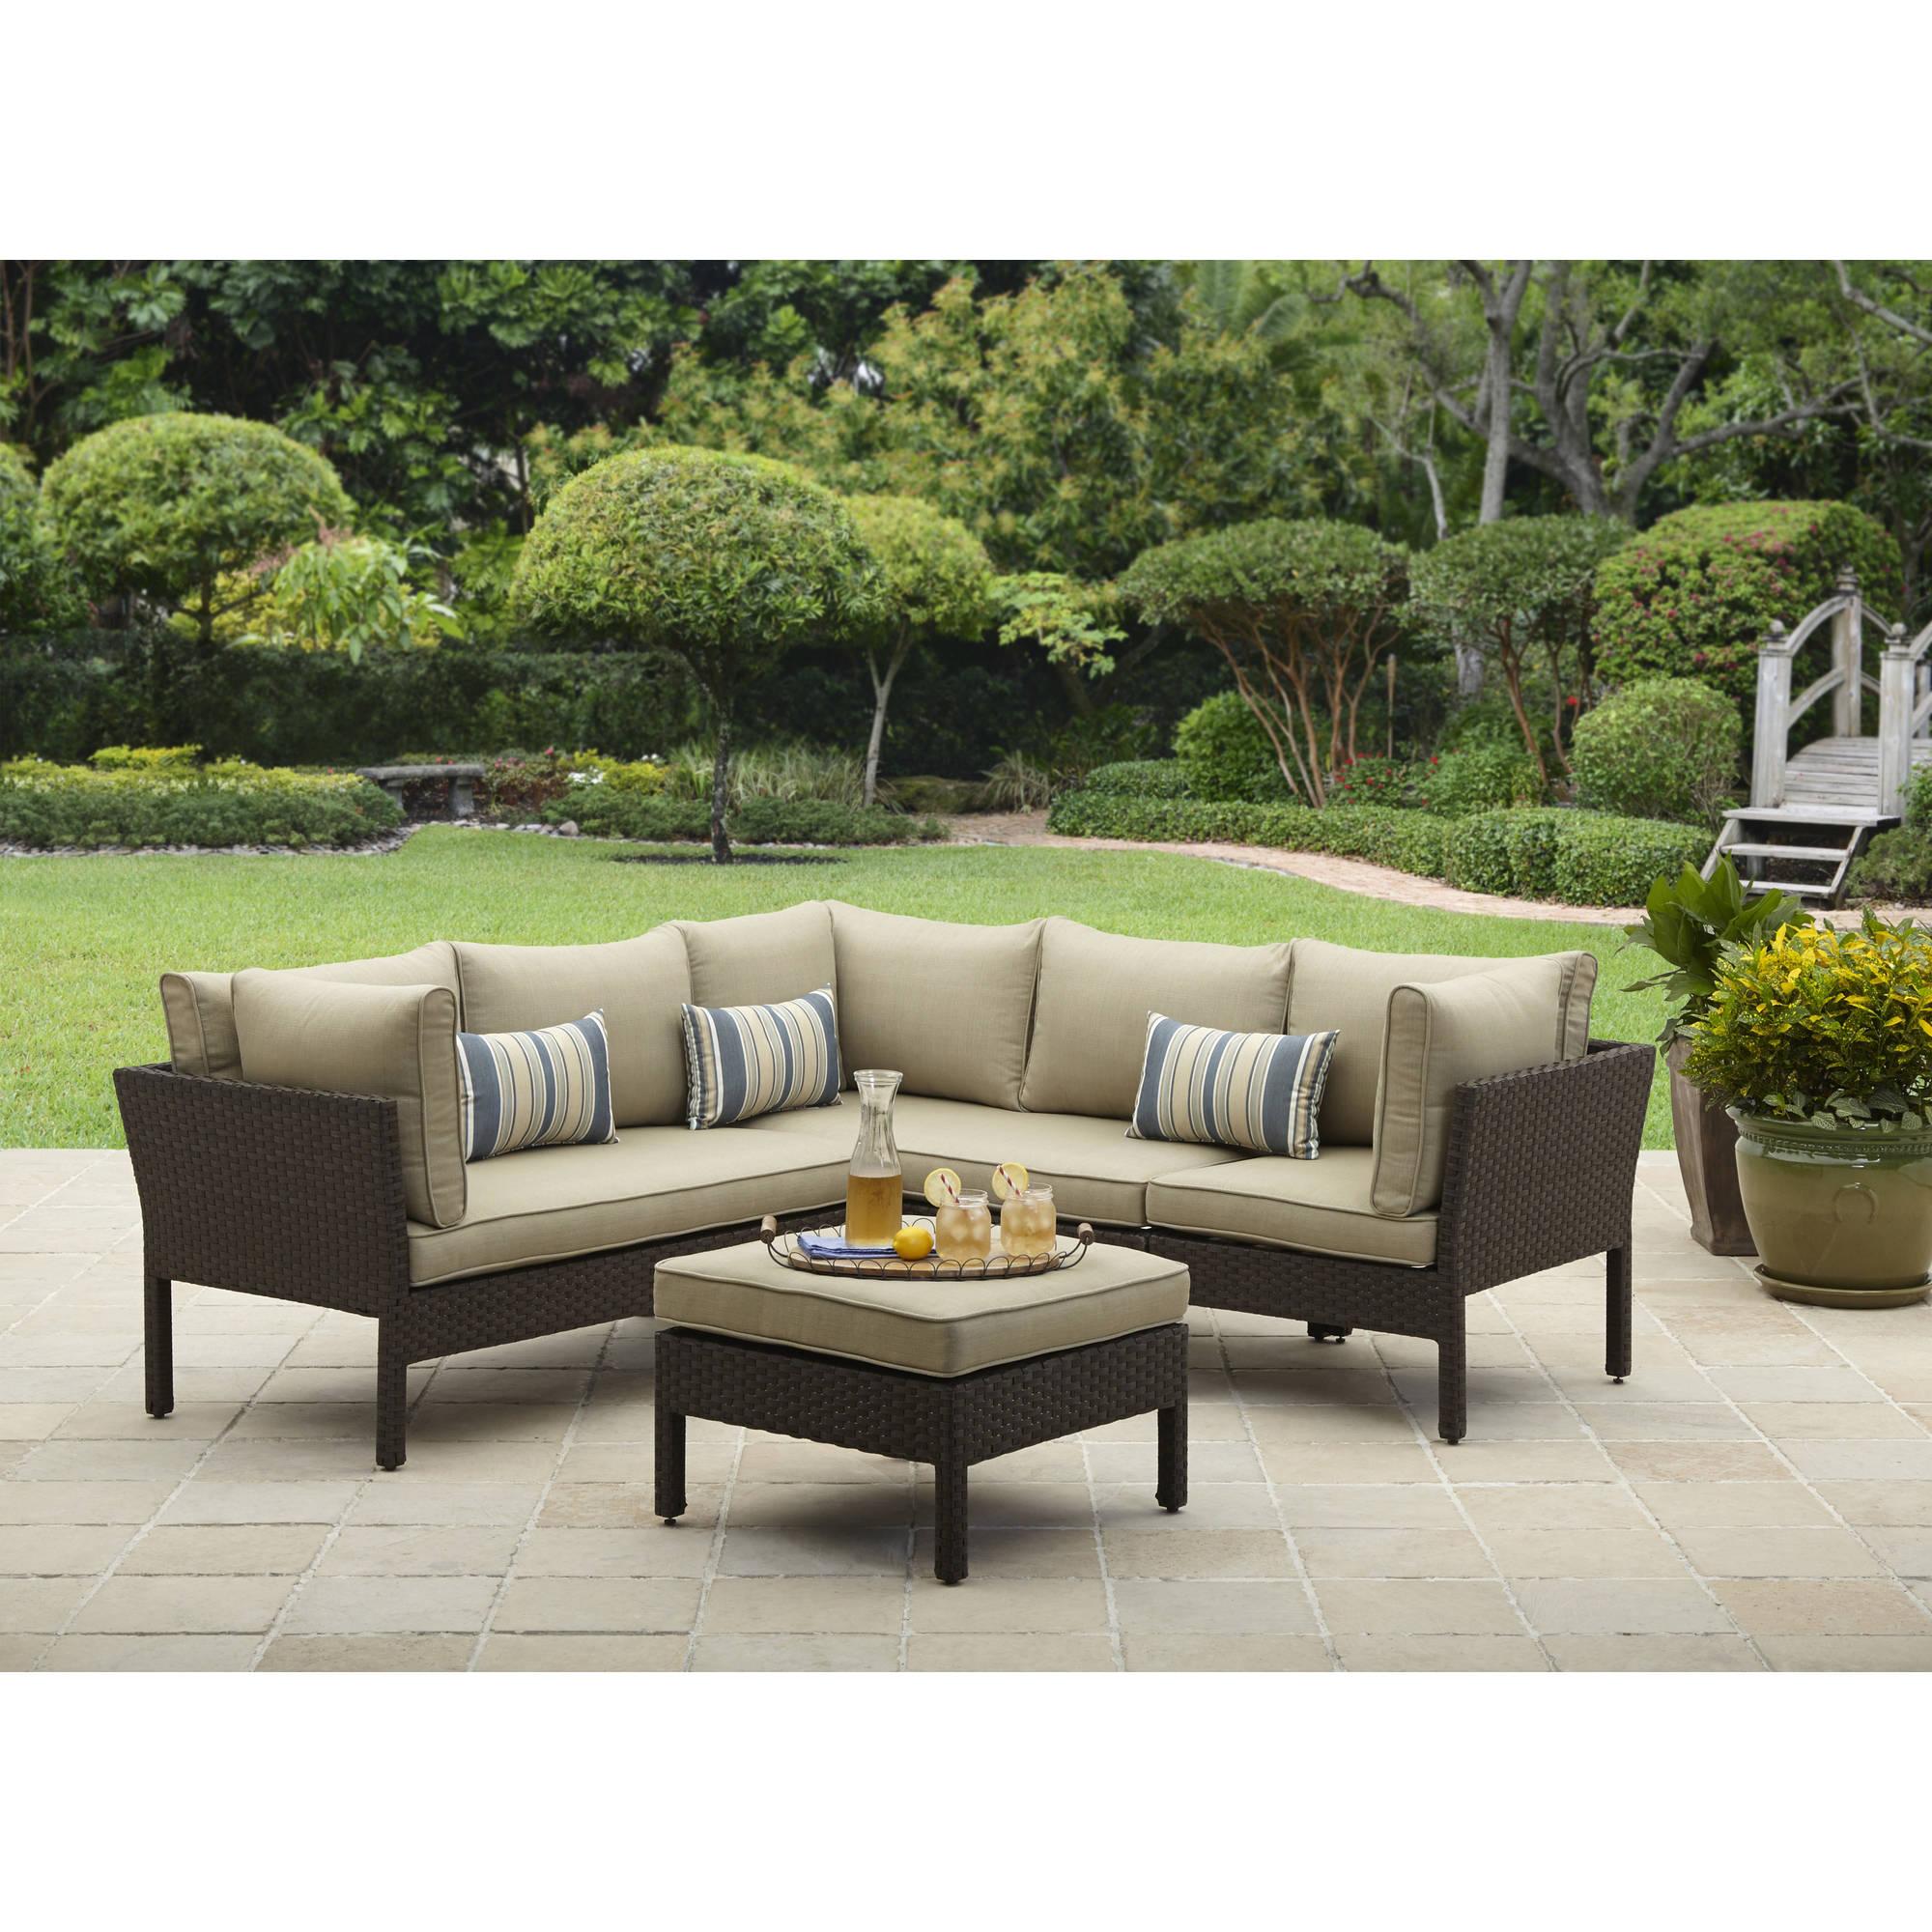 Better Homes And Gardens Avila Beach Piece Sectional Walmartcom - Better homes and garden patio set